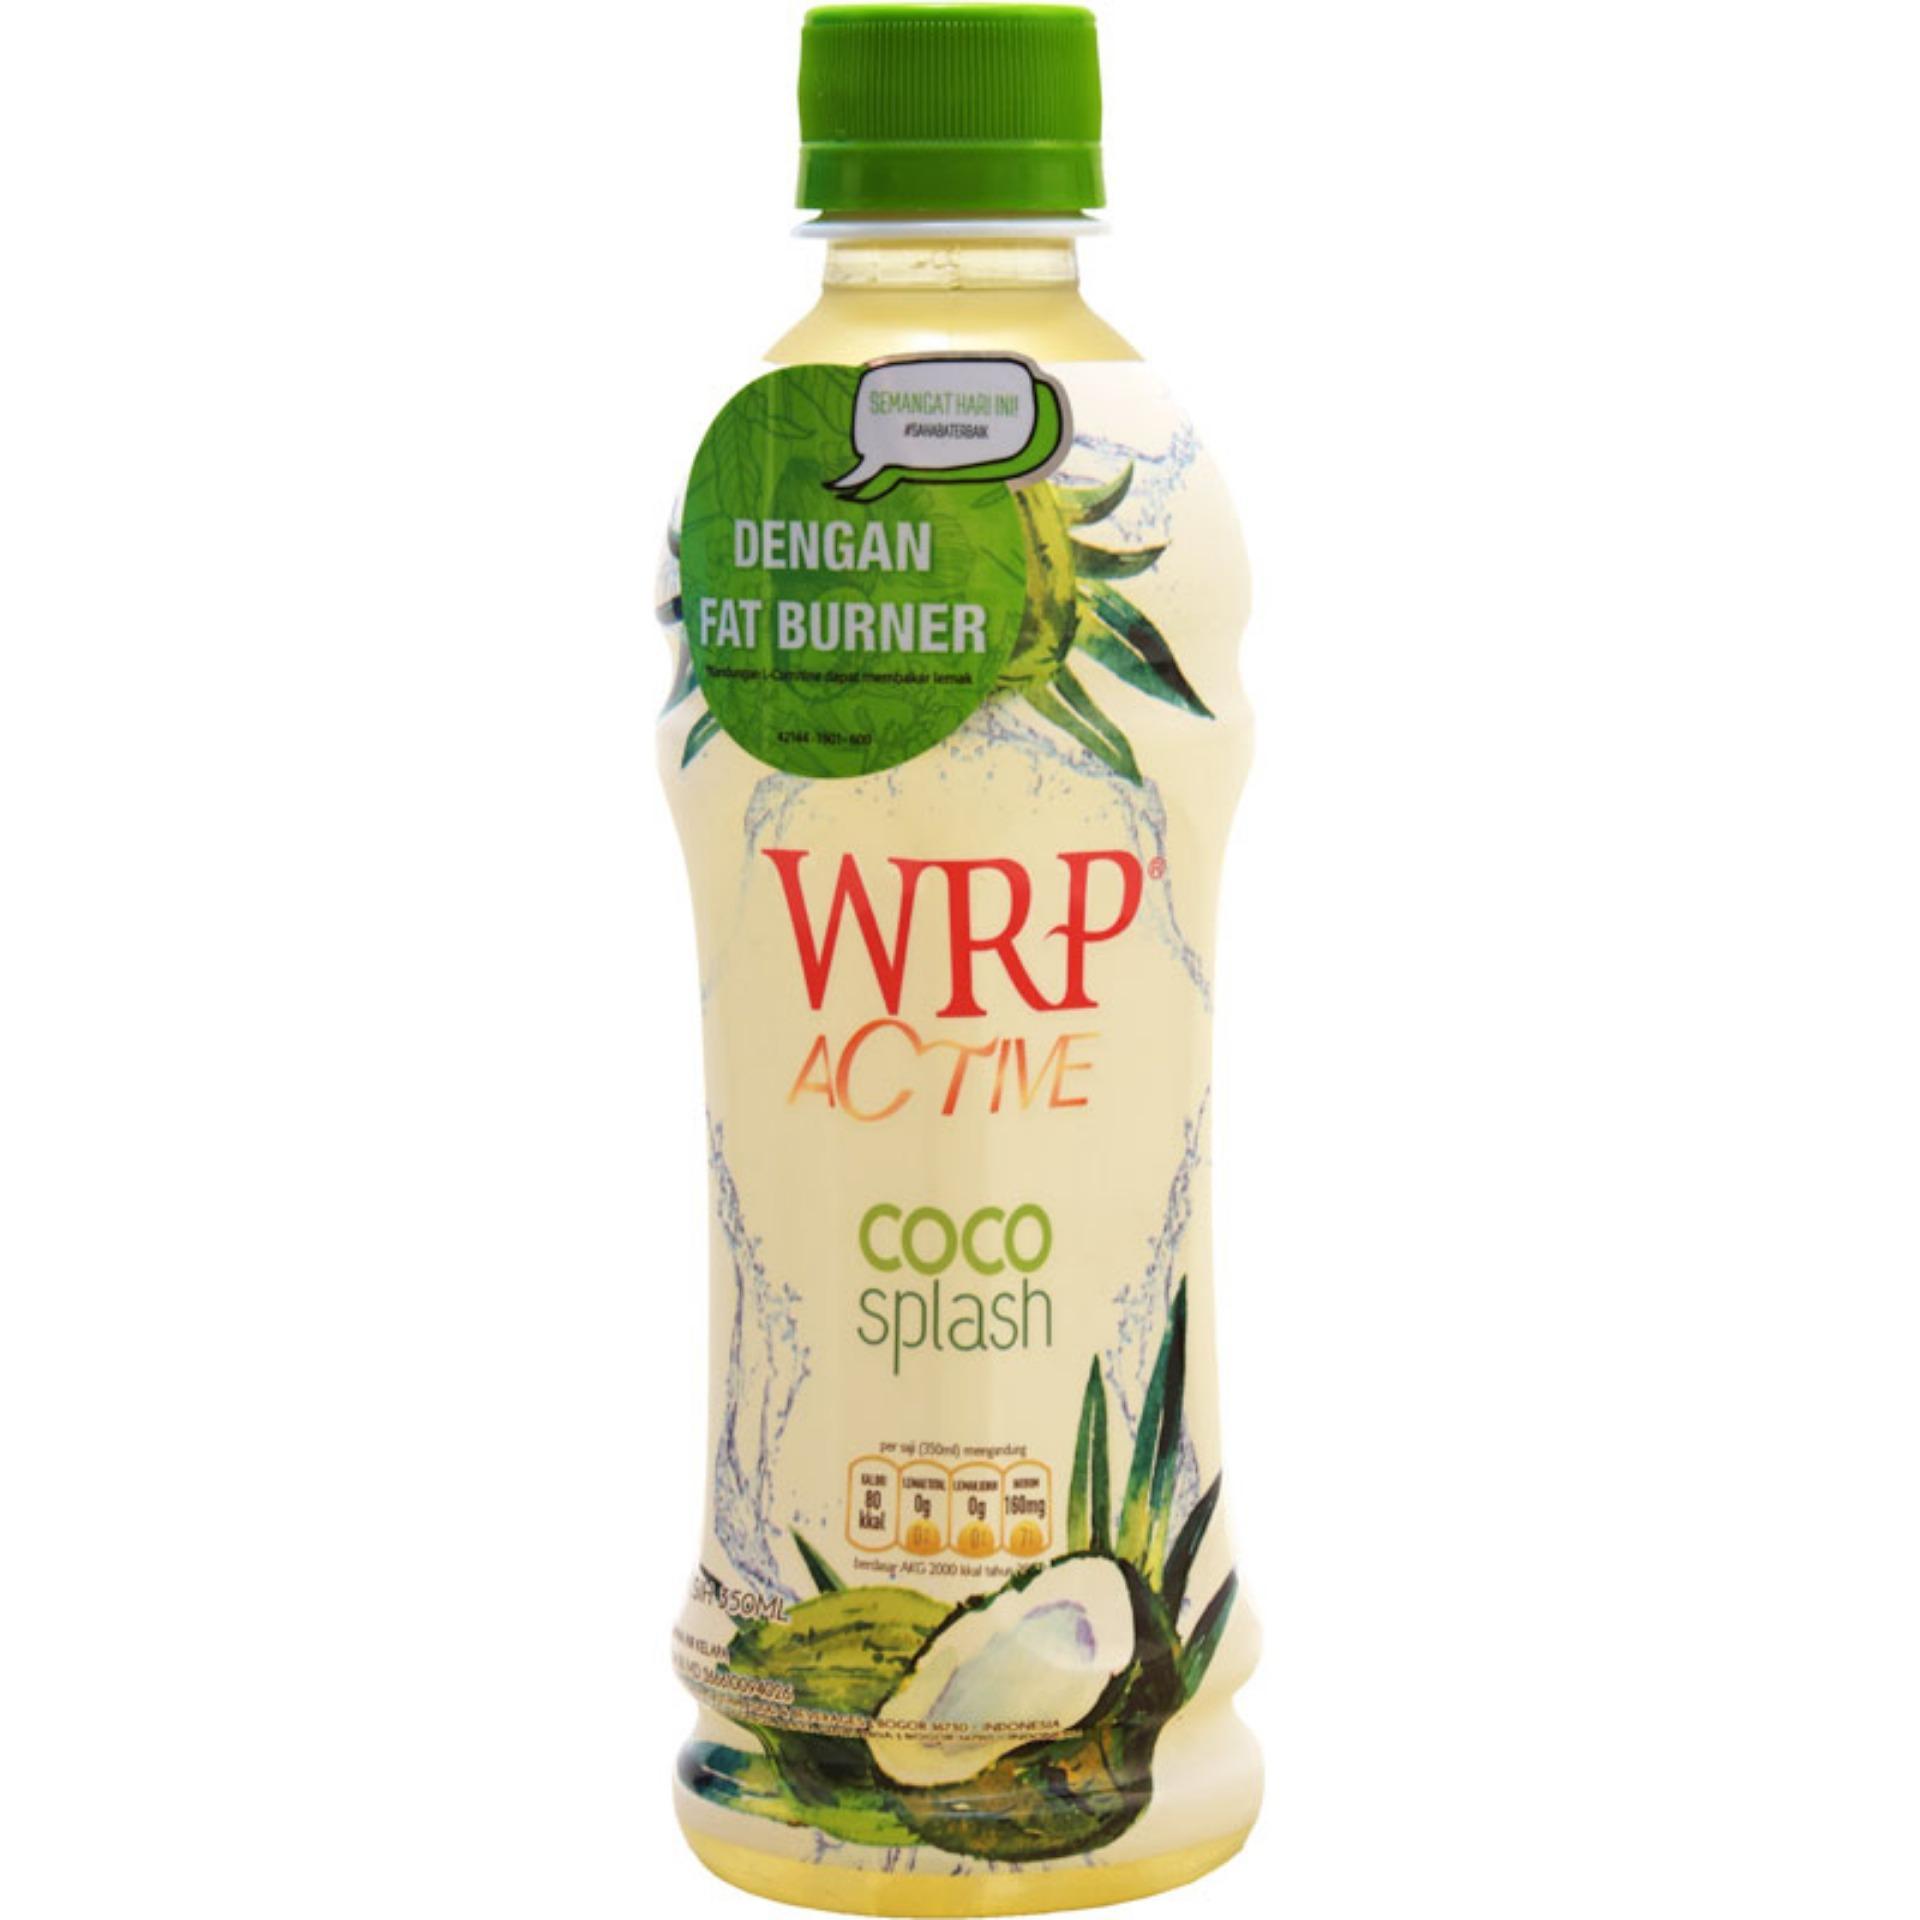 Kehebatan Wrp Fruitbar 20g Dan Harga Update Teknologi Active Coco Splash 350 Ml Bundle 3 350ml